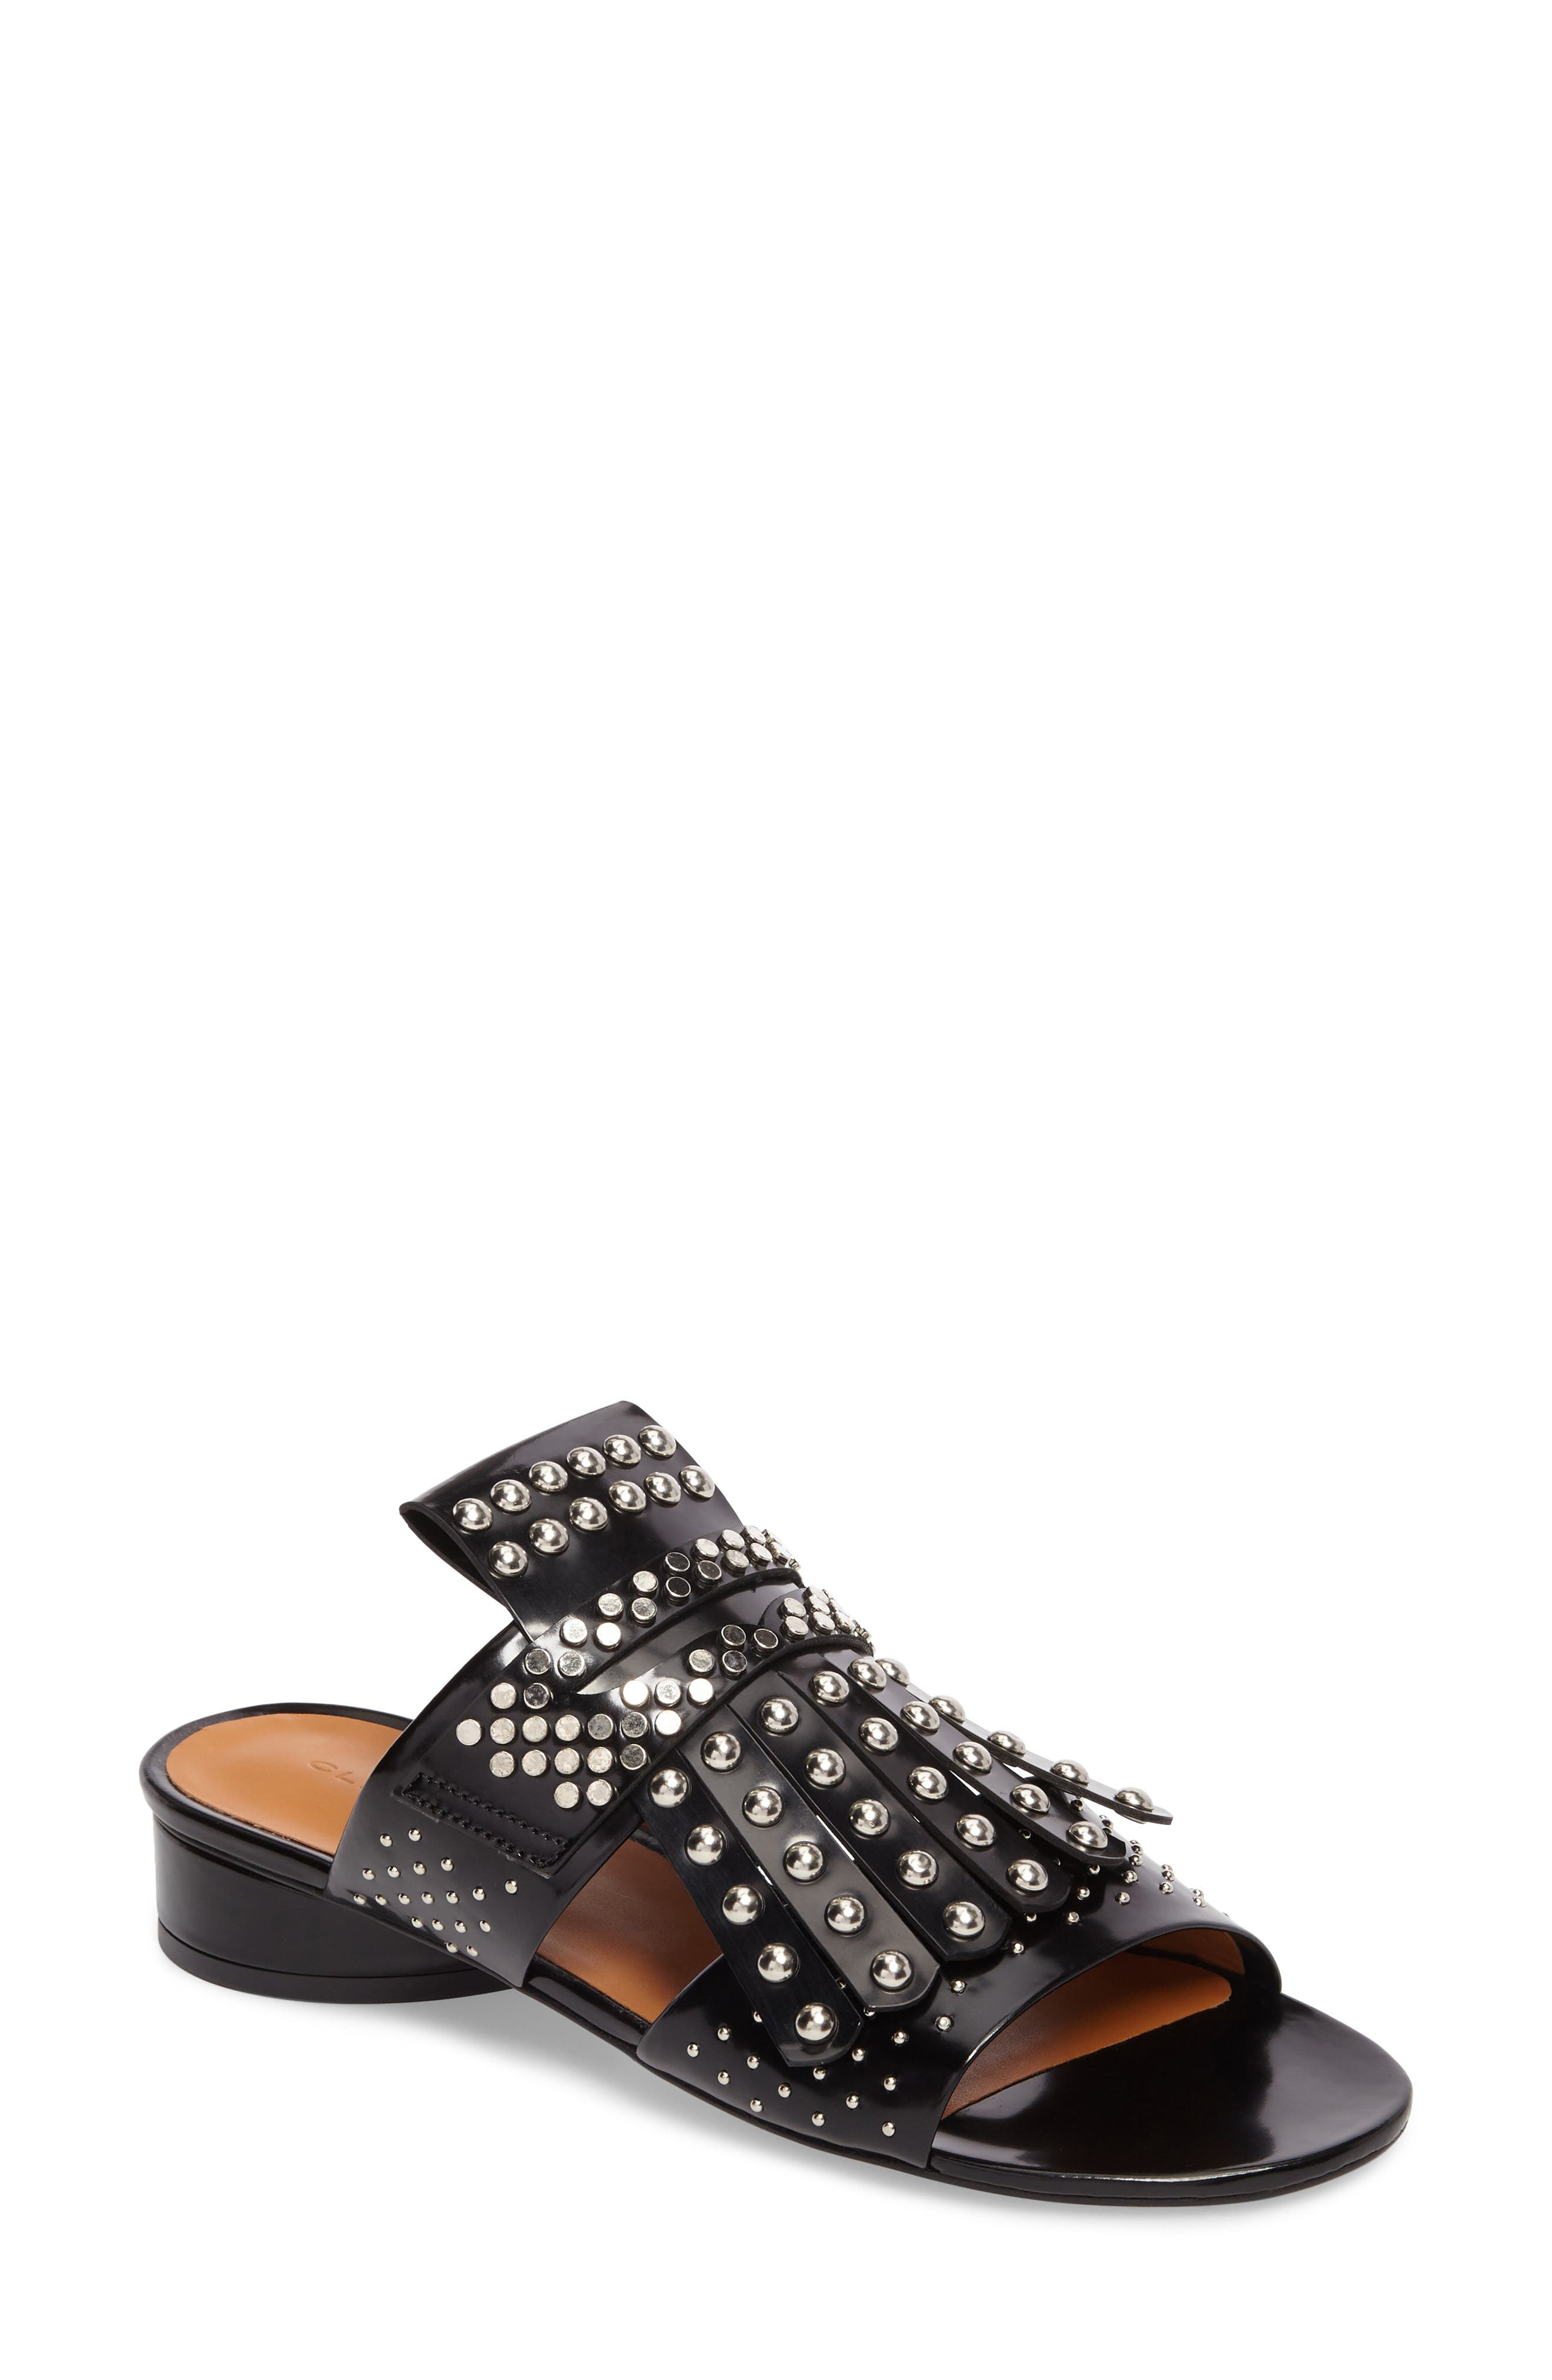 Figlouc Studded Sandal,                         Main,                         color, Black